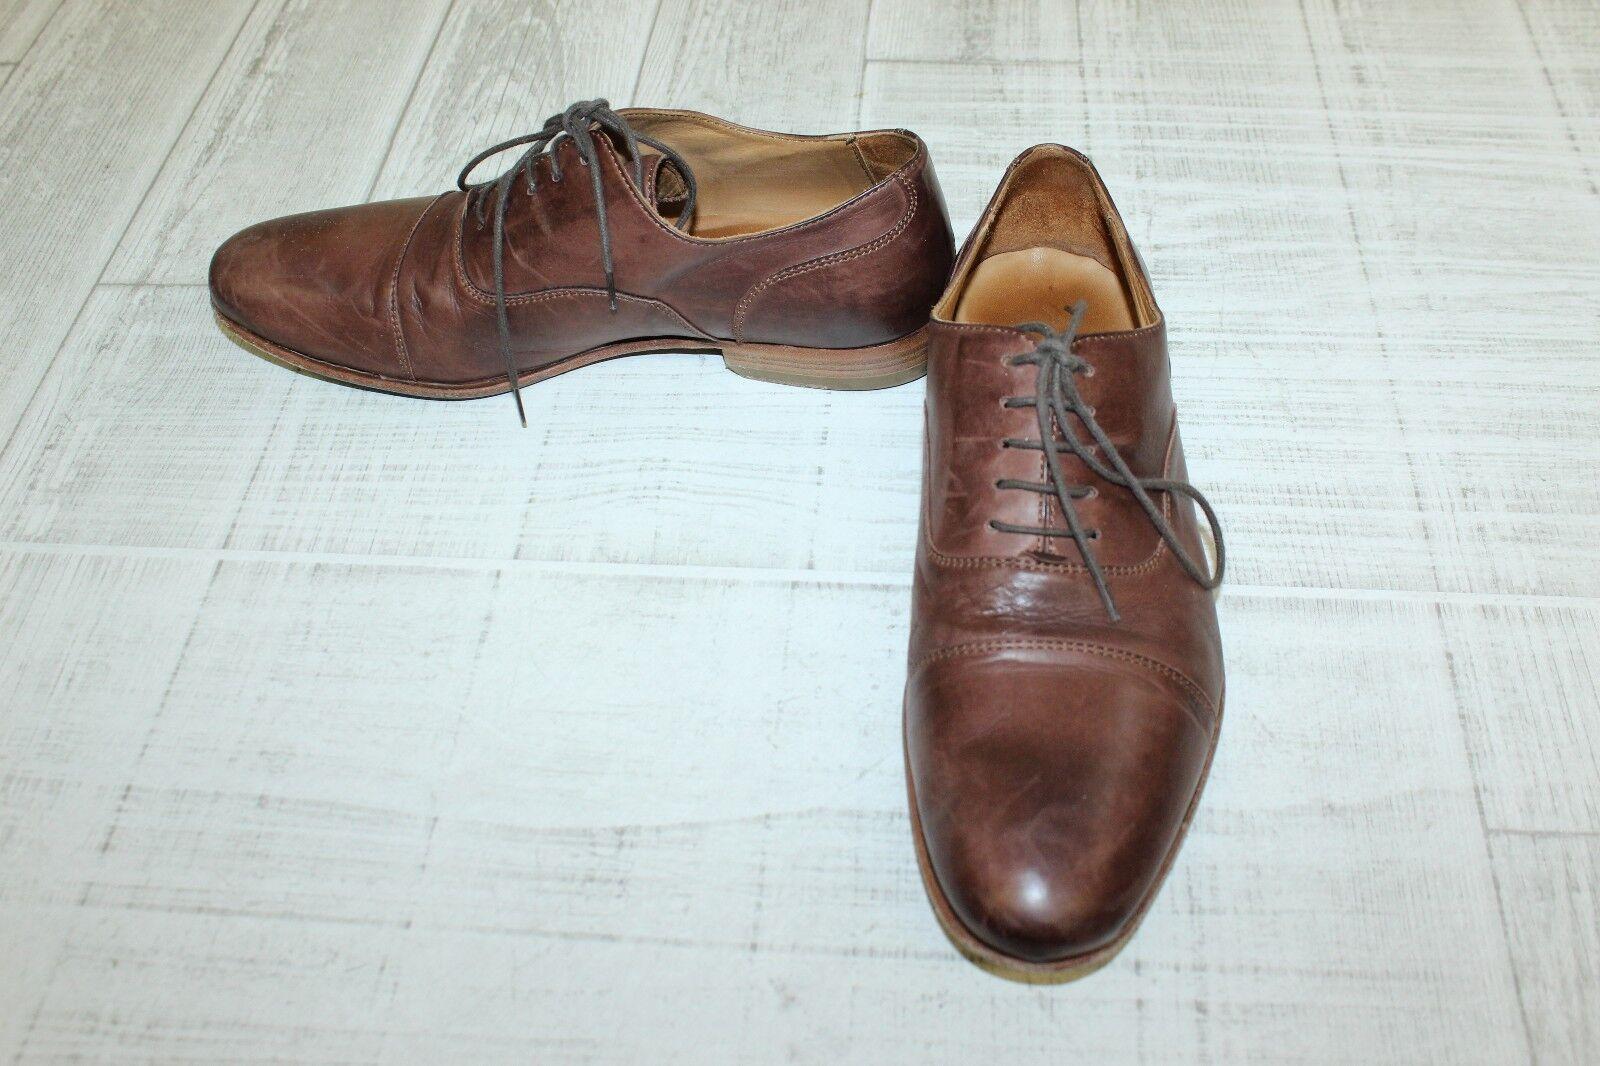 Massimo Matteo 58591 Cap Toe Bal 7, Oxford - Men's Size 7, Bal Brown d0f544